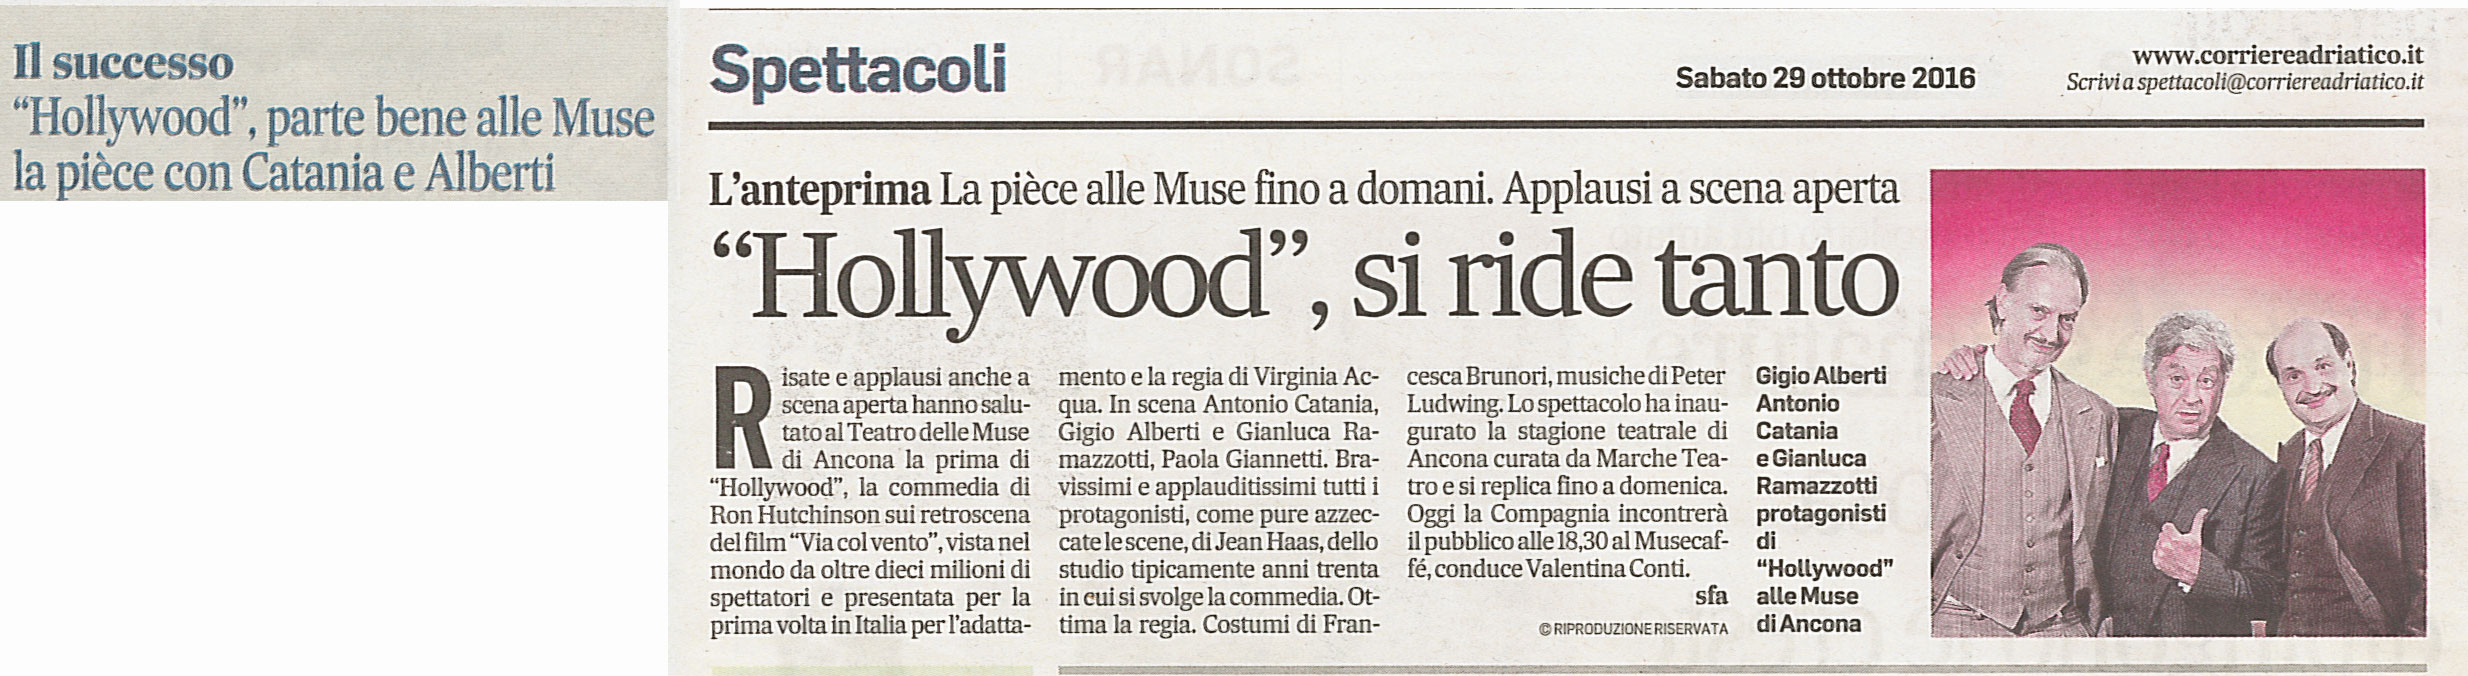 2016_10_29_hollywood-si-ride-tanto_corriere-adriatico